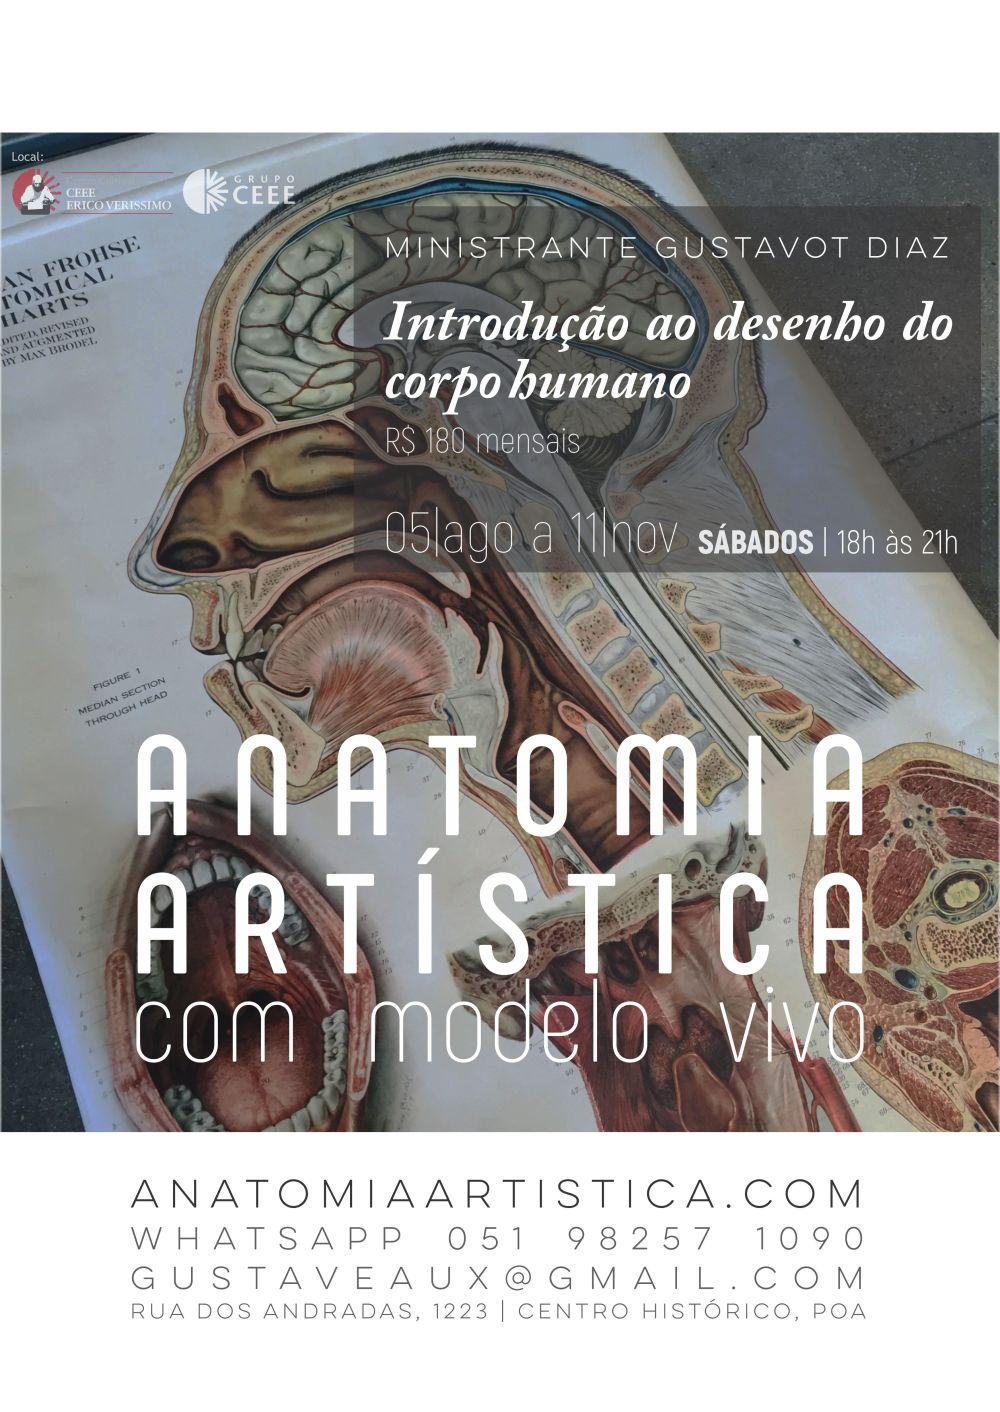 Flyer WEB, Anatomia artística, 2017, II CEEEV.jpg